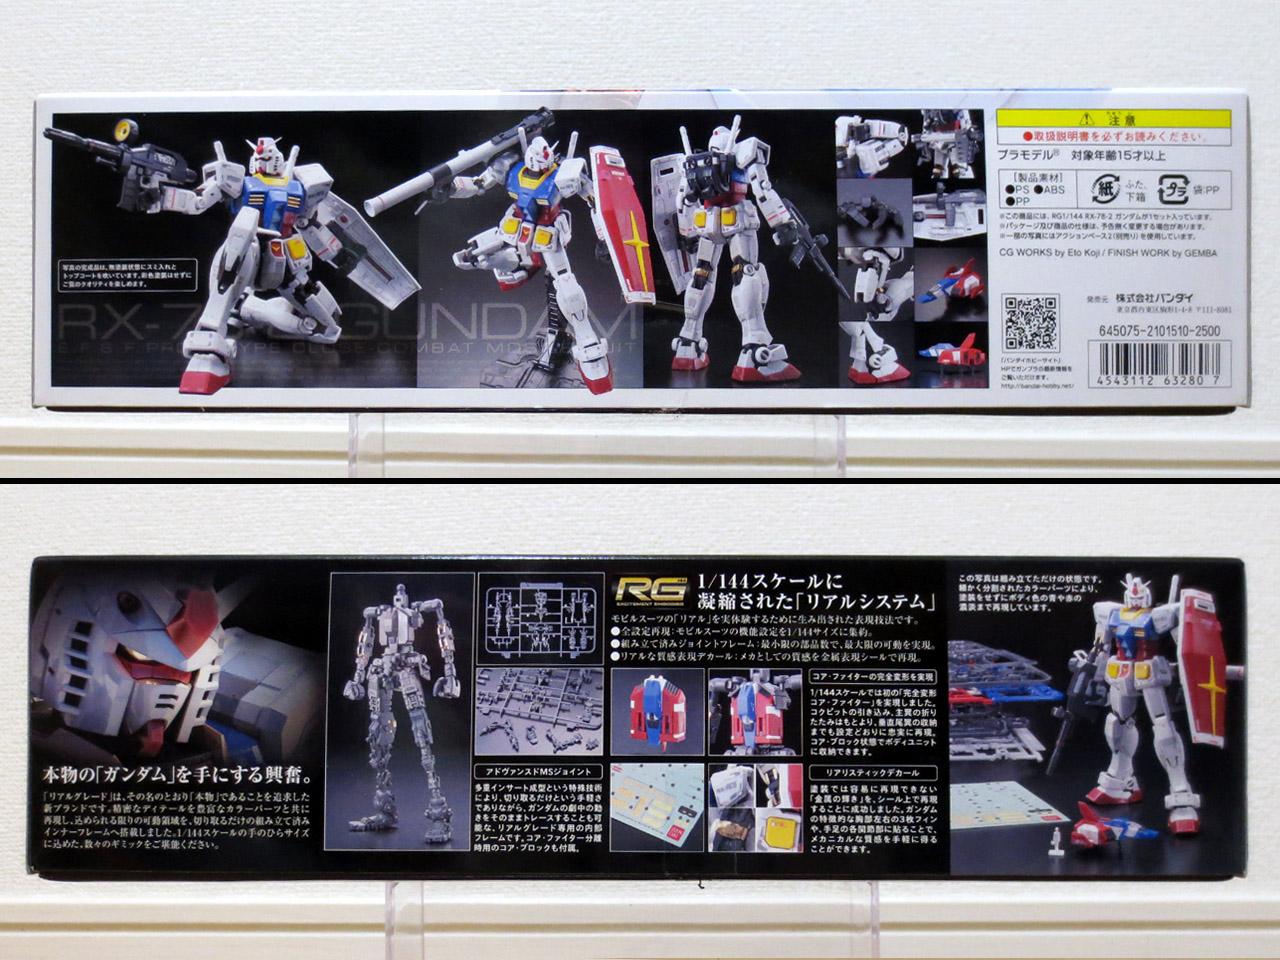 RG_RX78_2_Gundam_02.jpg